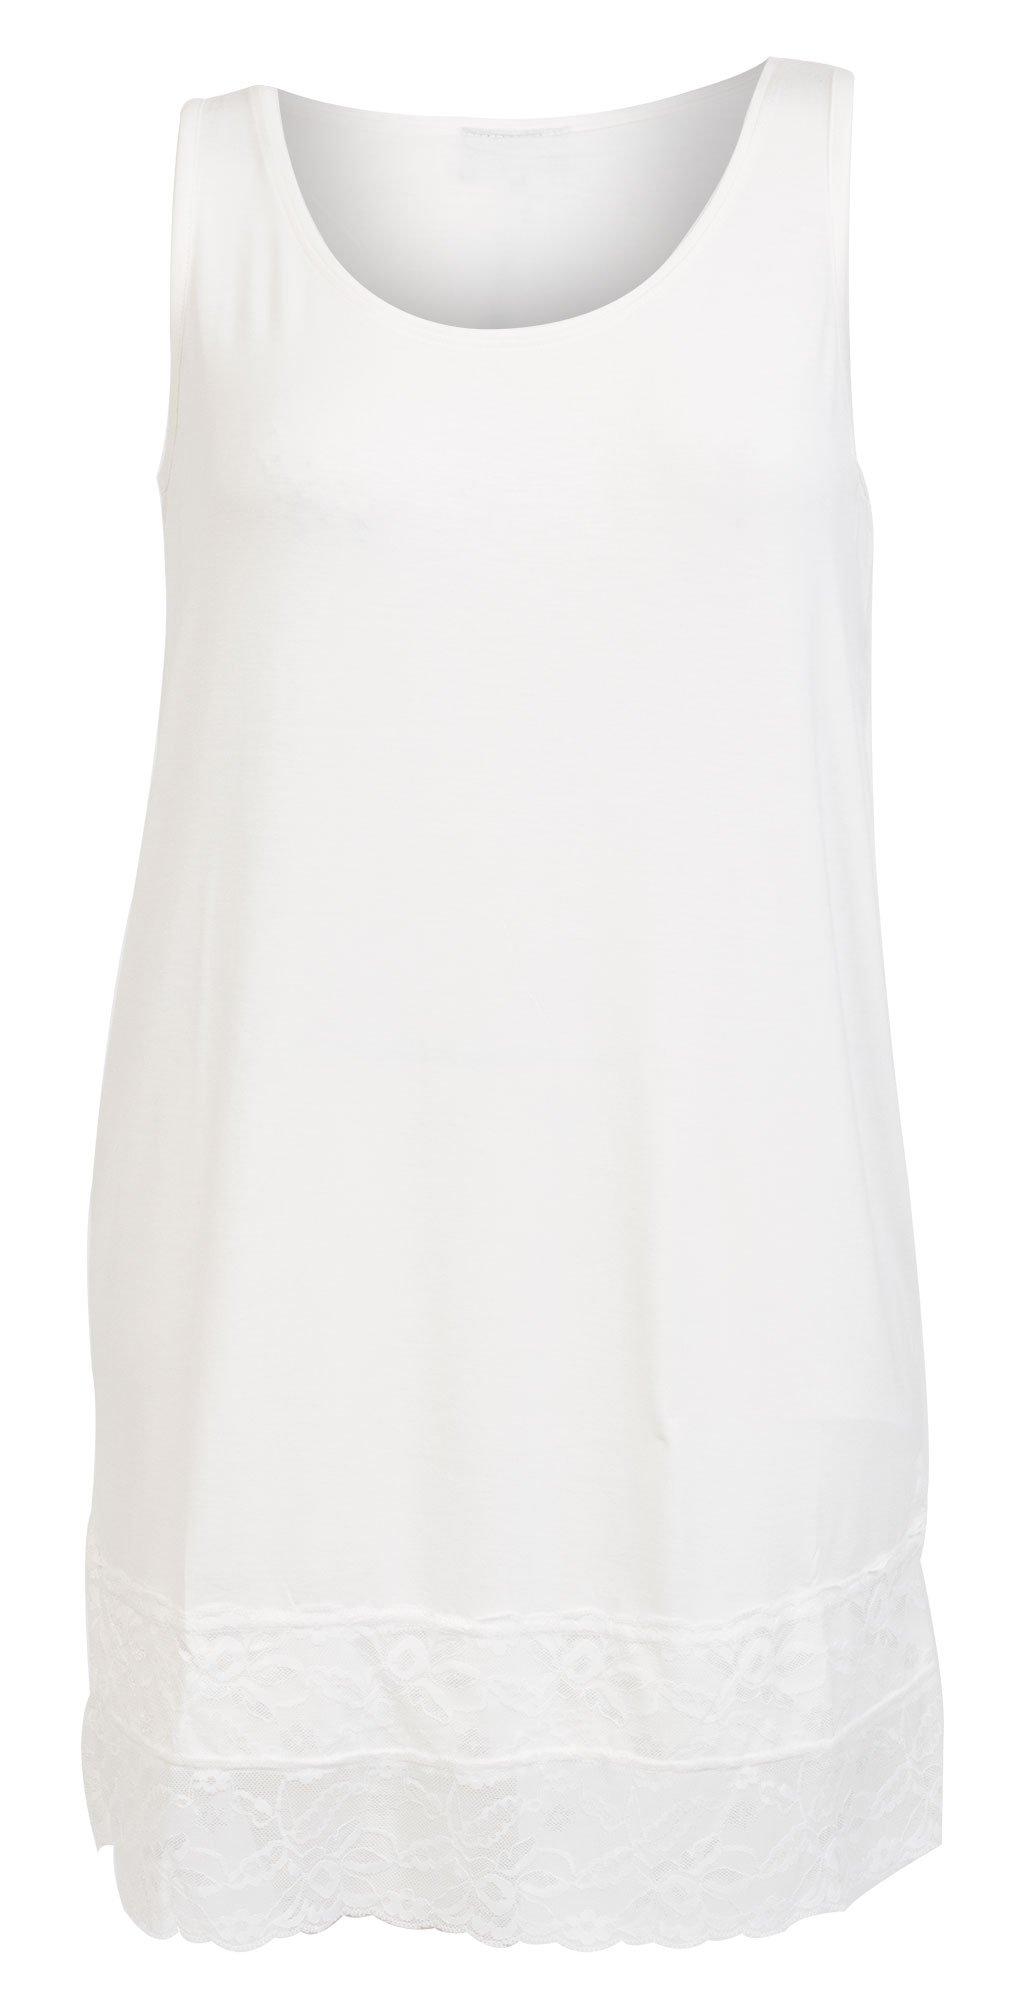 Lang lys top / underkjole med bred blonde kant